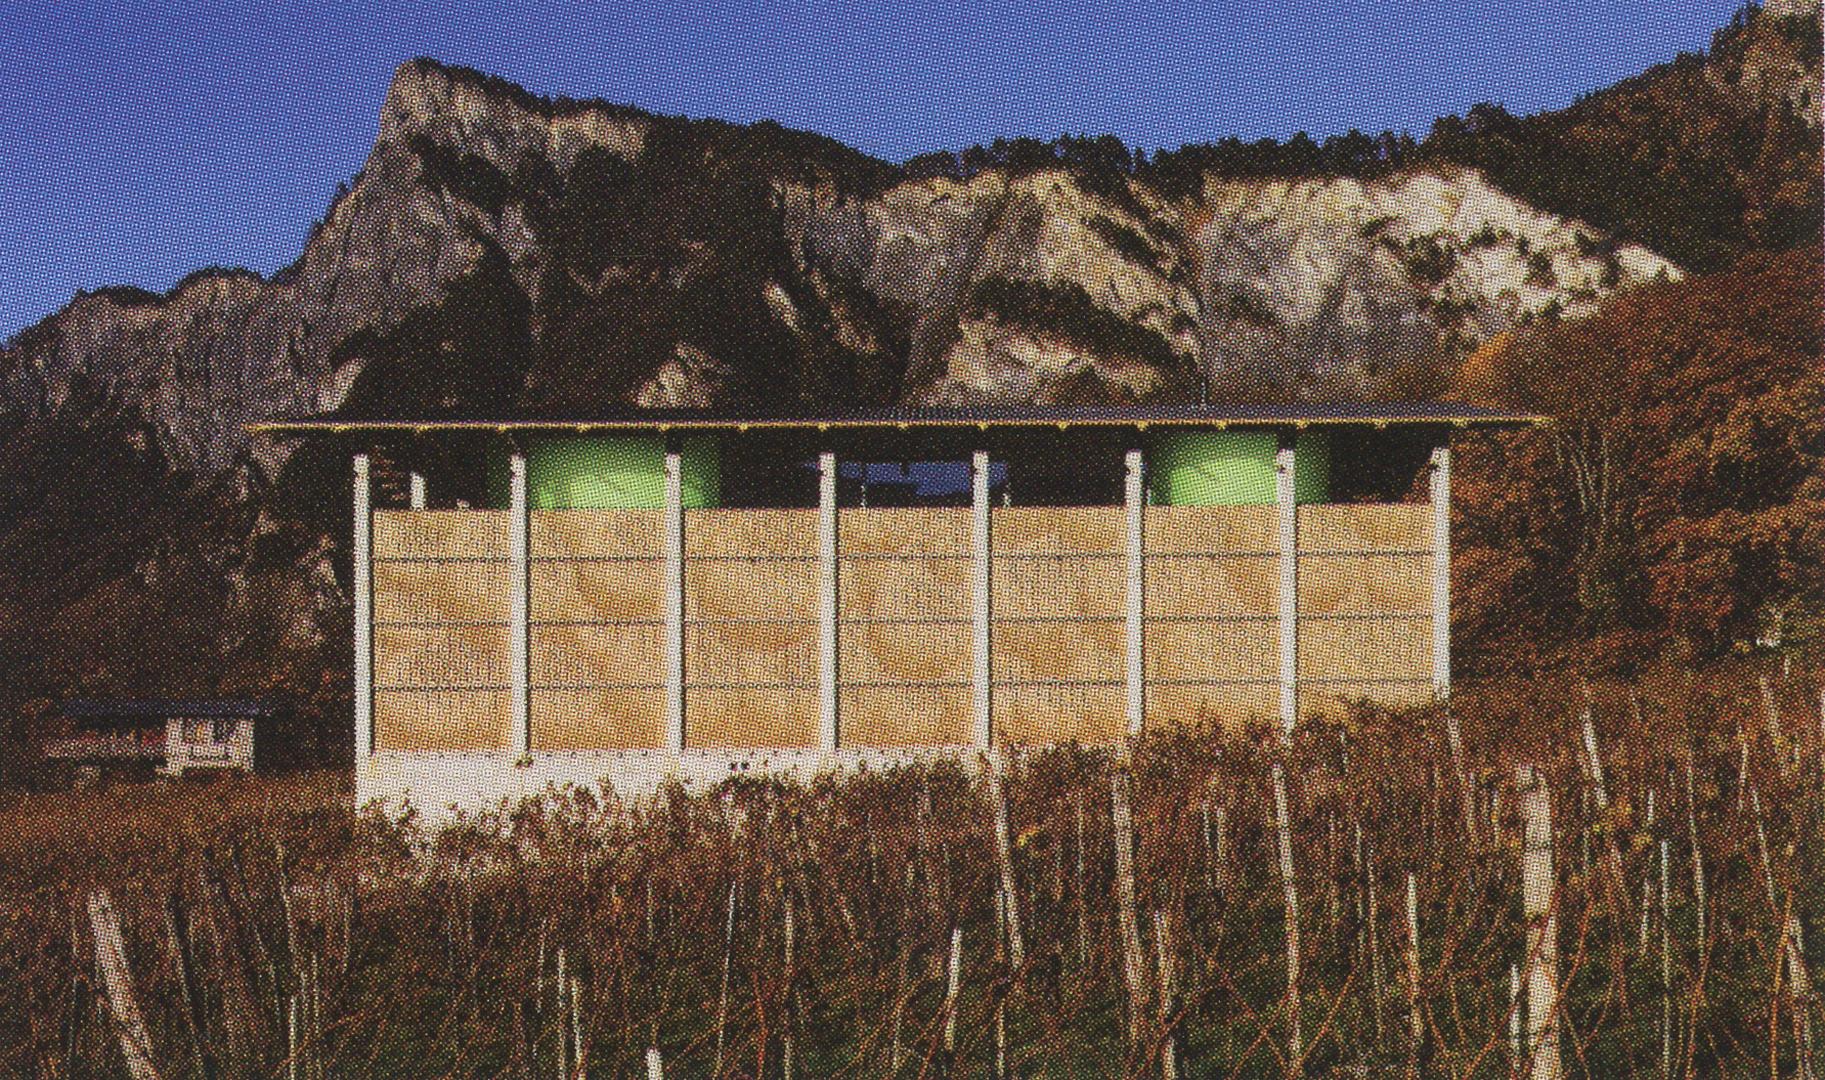 ©2008, Tobias Bonwetsch, Gantenbein Vineyard Façade, Fläsch